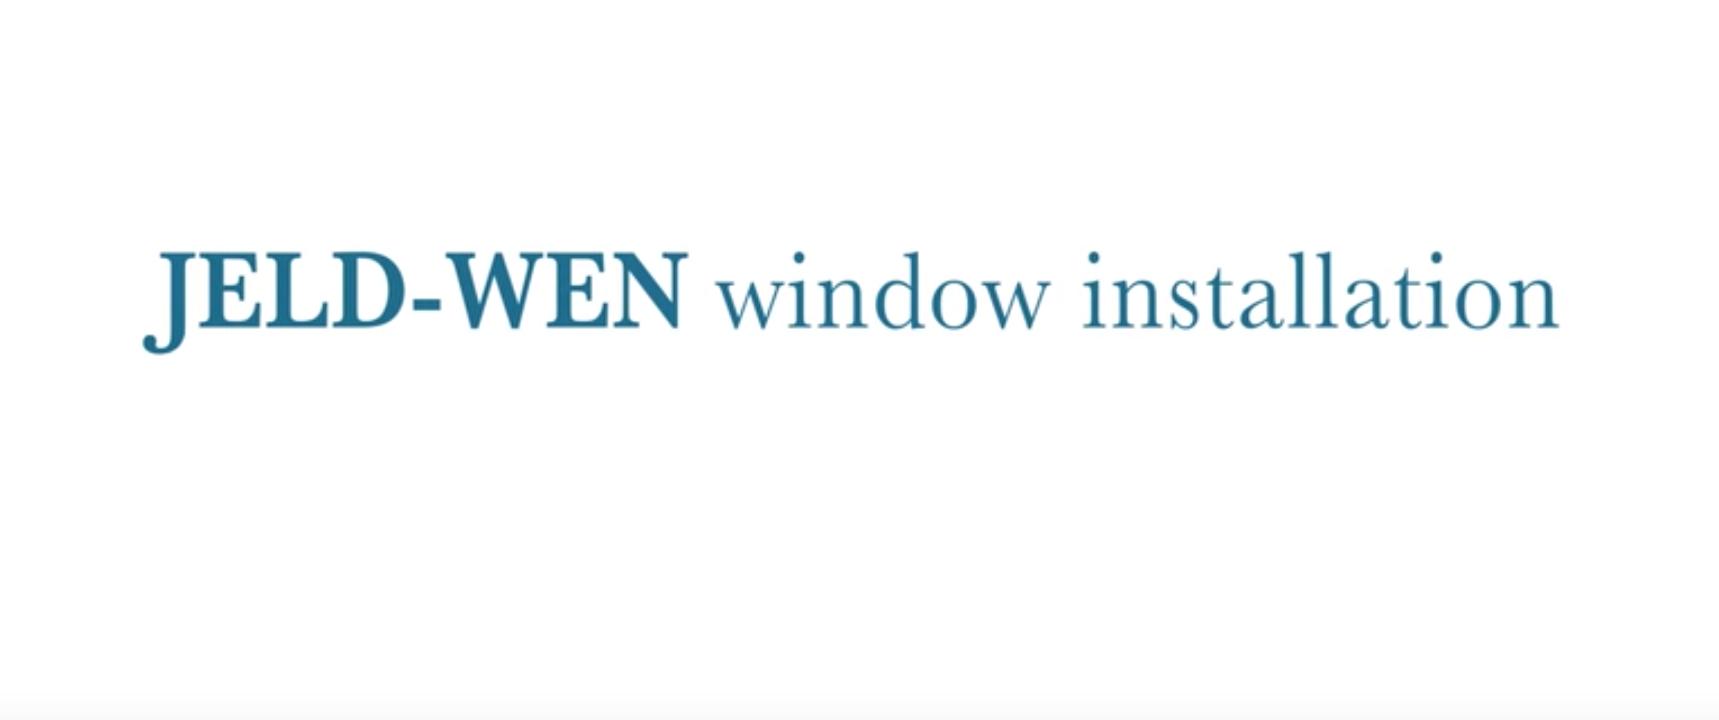 10 Essential Steps For A Proper Window Installation